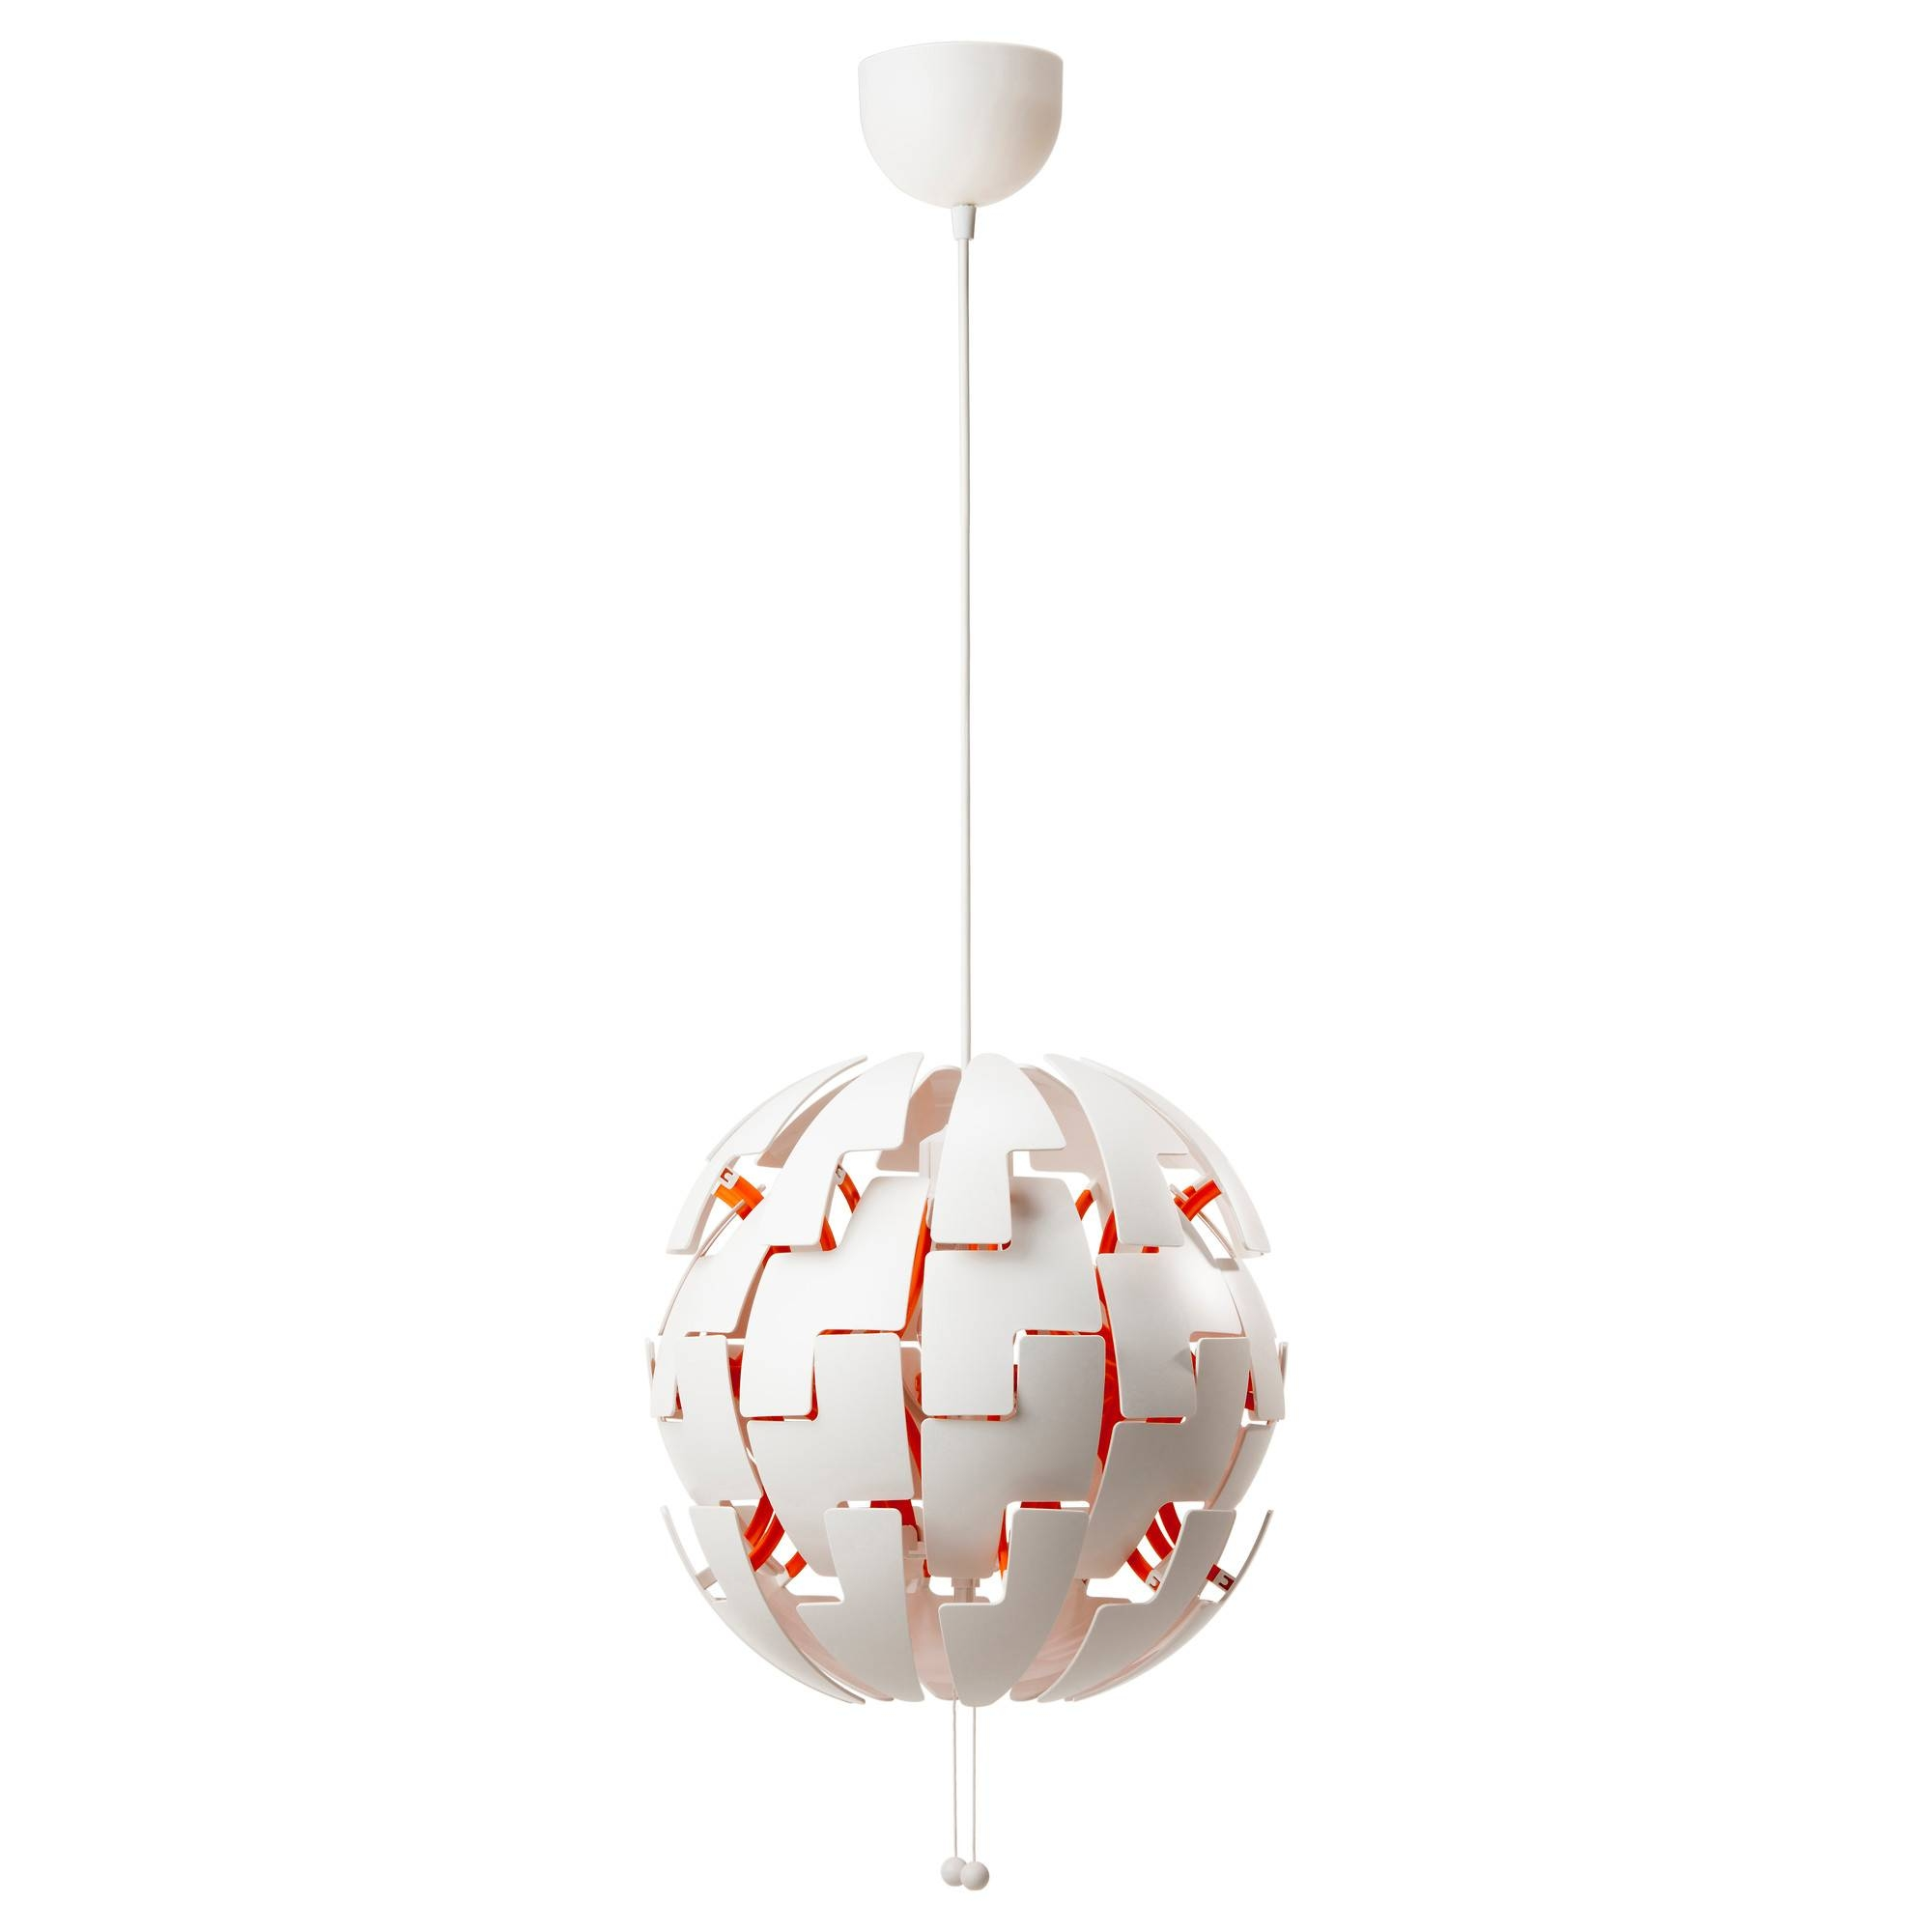 Top 15 of Ikea Globe Pendant Lights